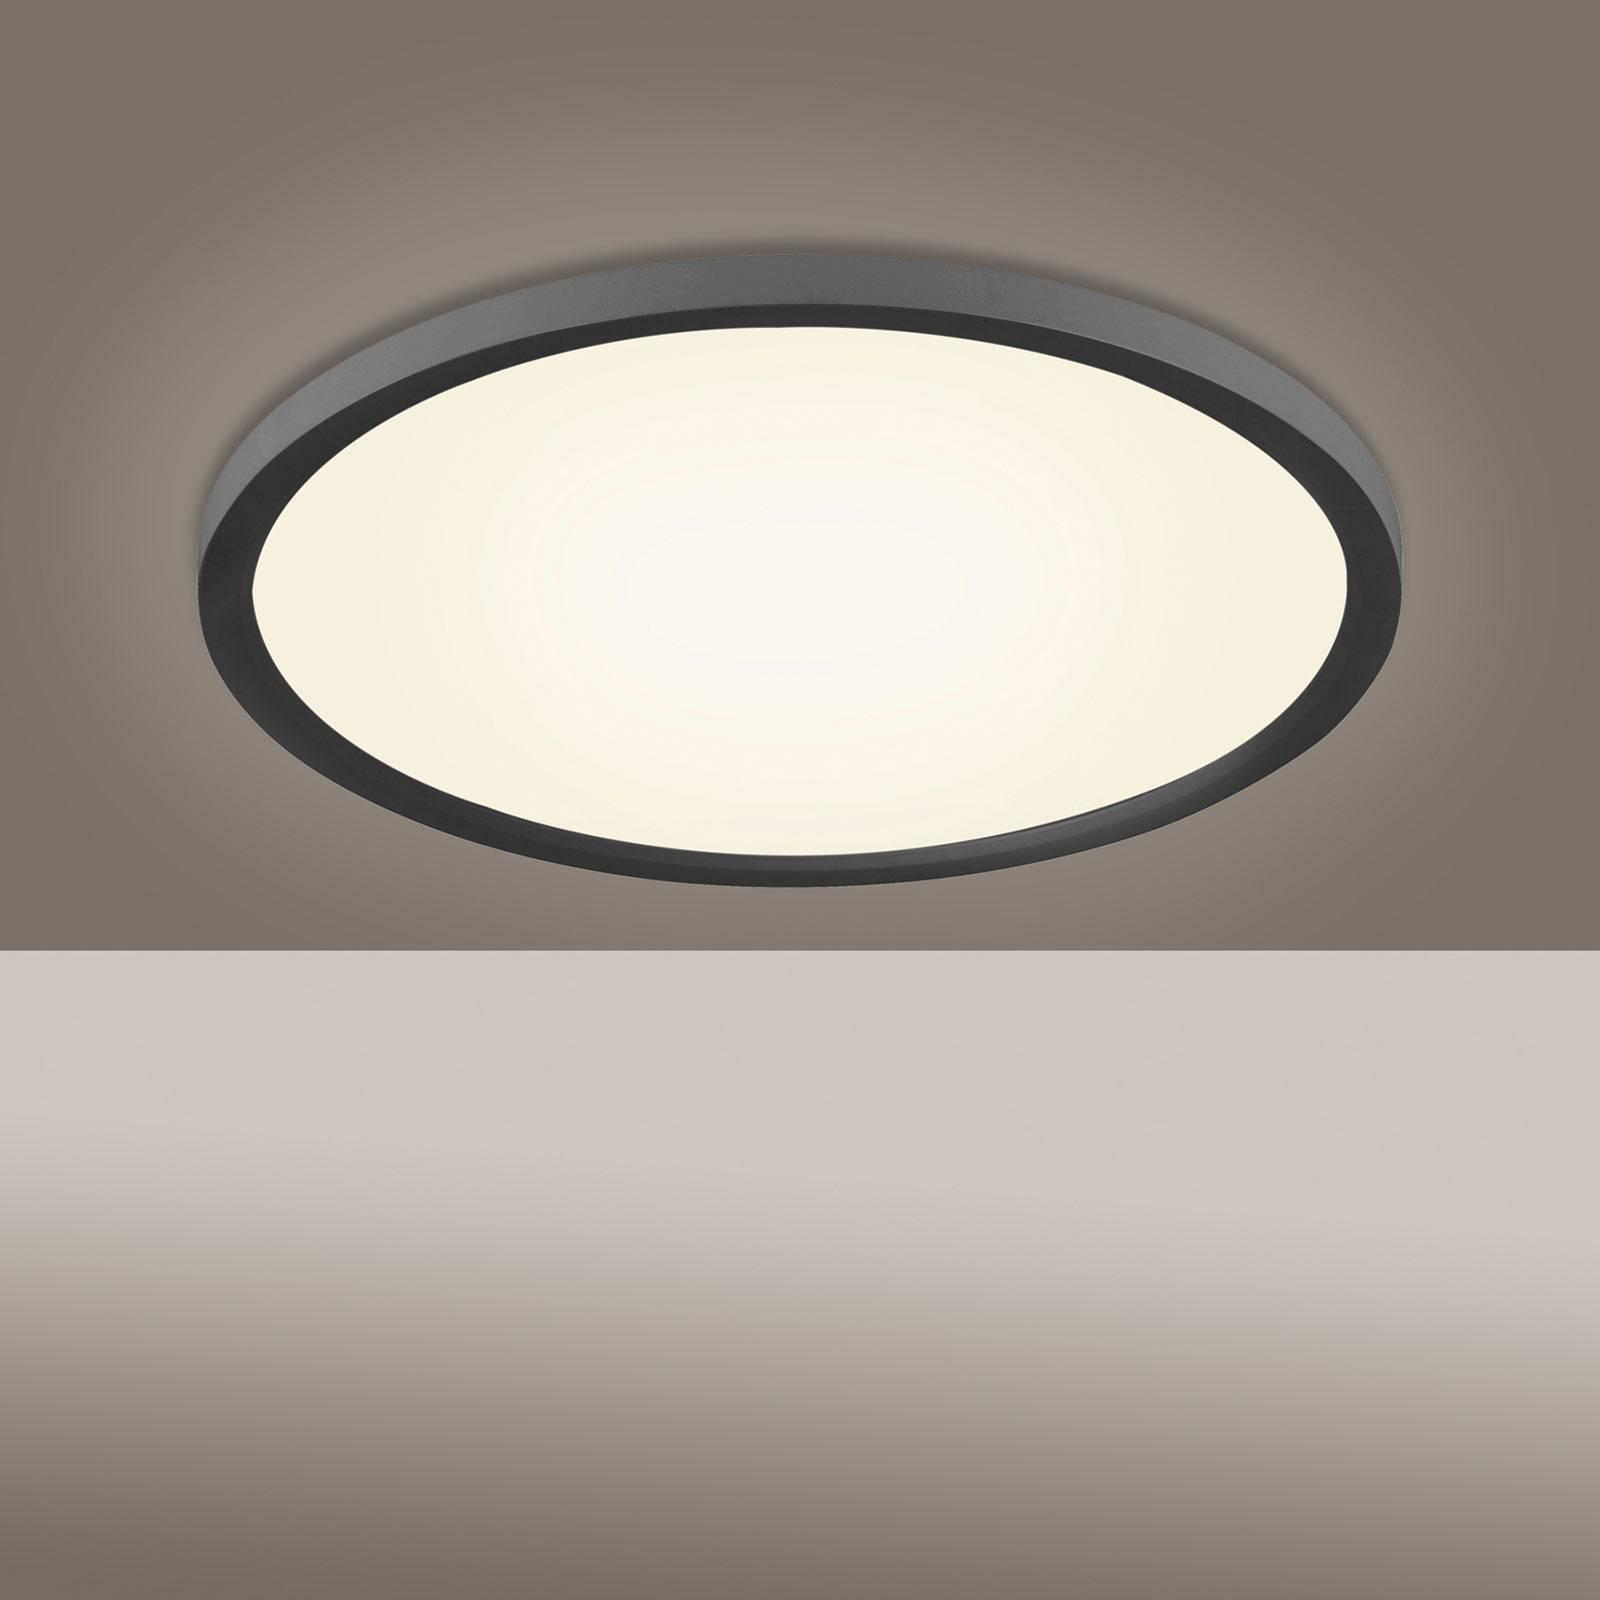 LED plafondlamp Flat CCT, Ø 40 cm, zwart